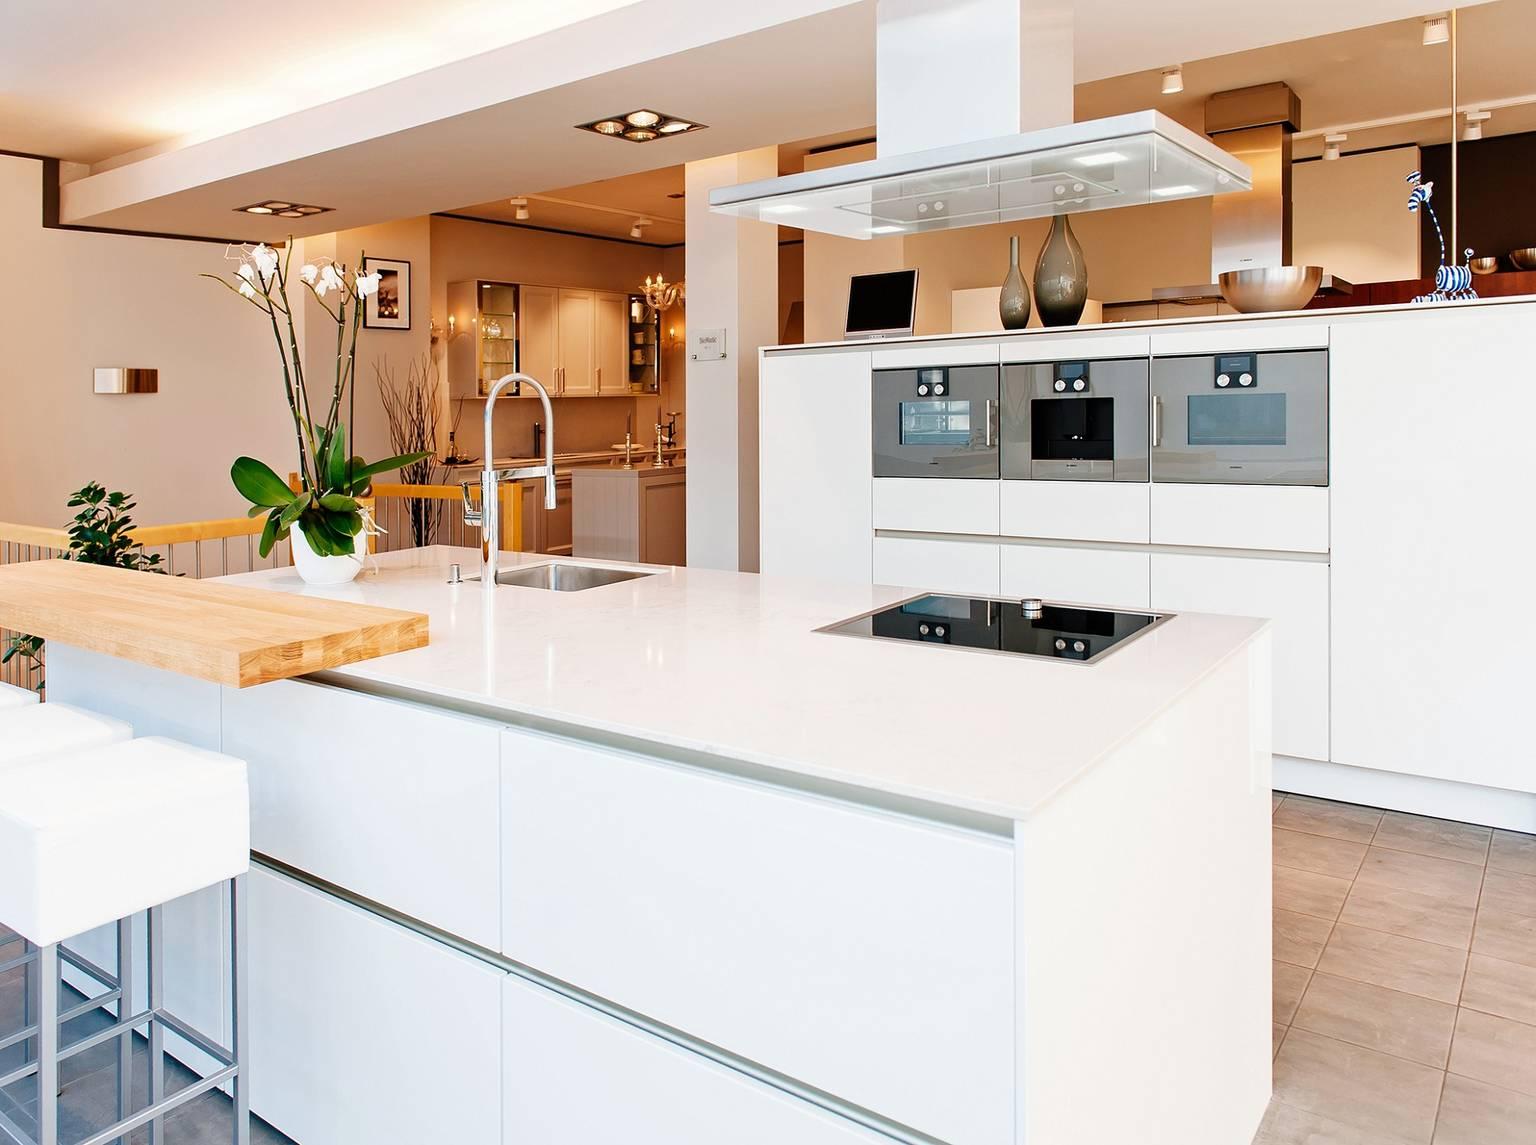 k chenstudio krampe k chen in kelkheim. Black Bedroom Furniture Sets. Home Design Ideas